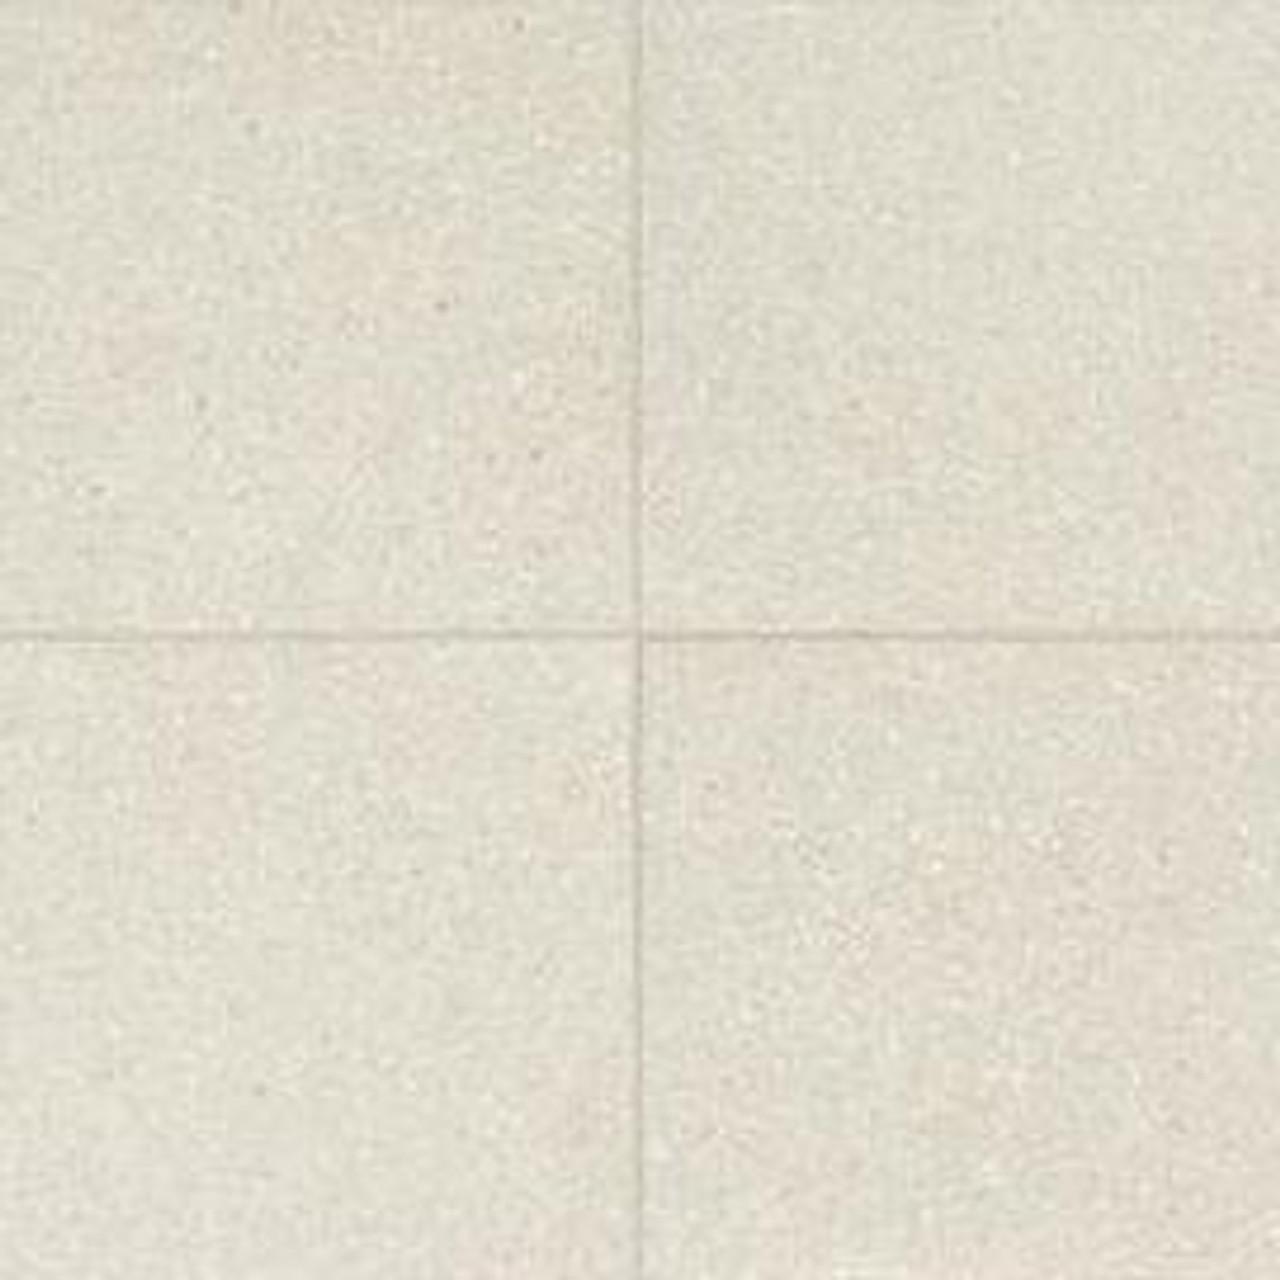 neospeck white porcelain 24x24